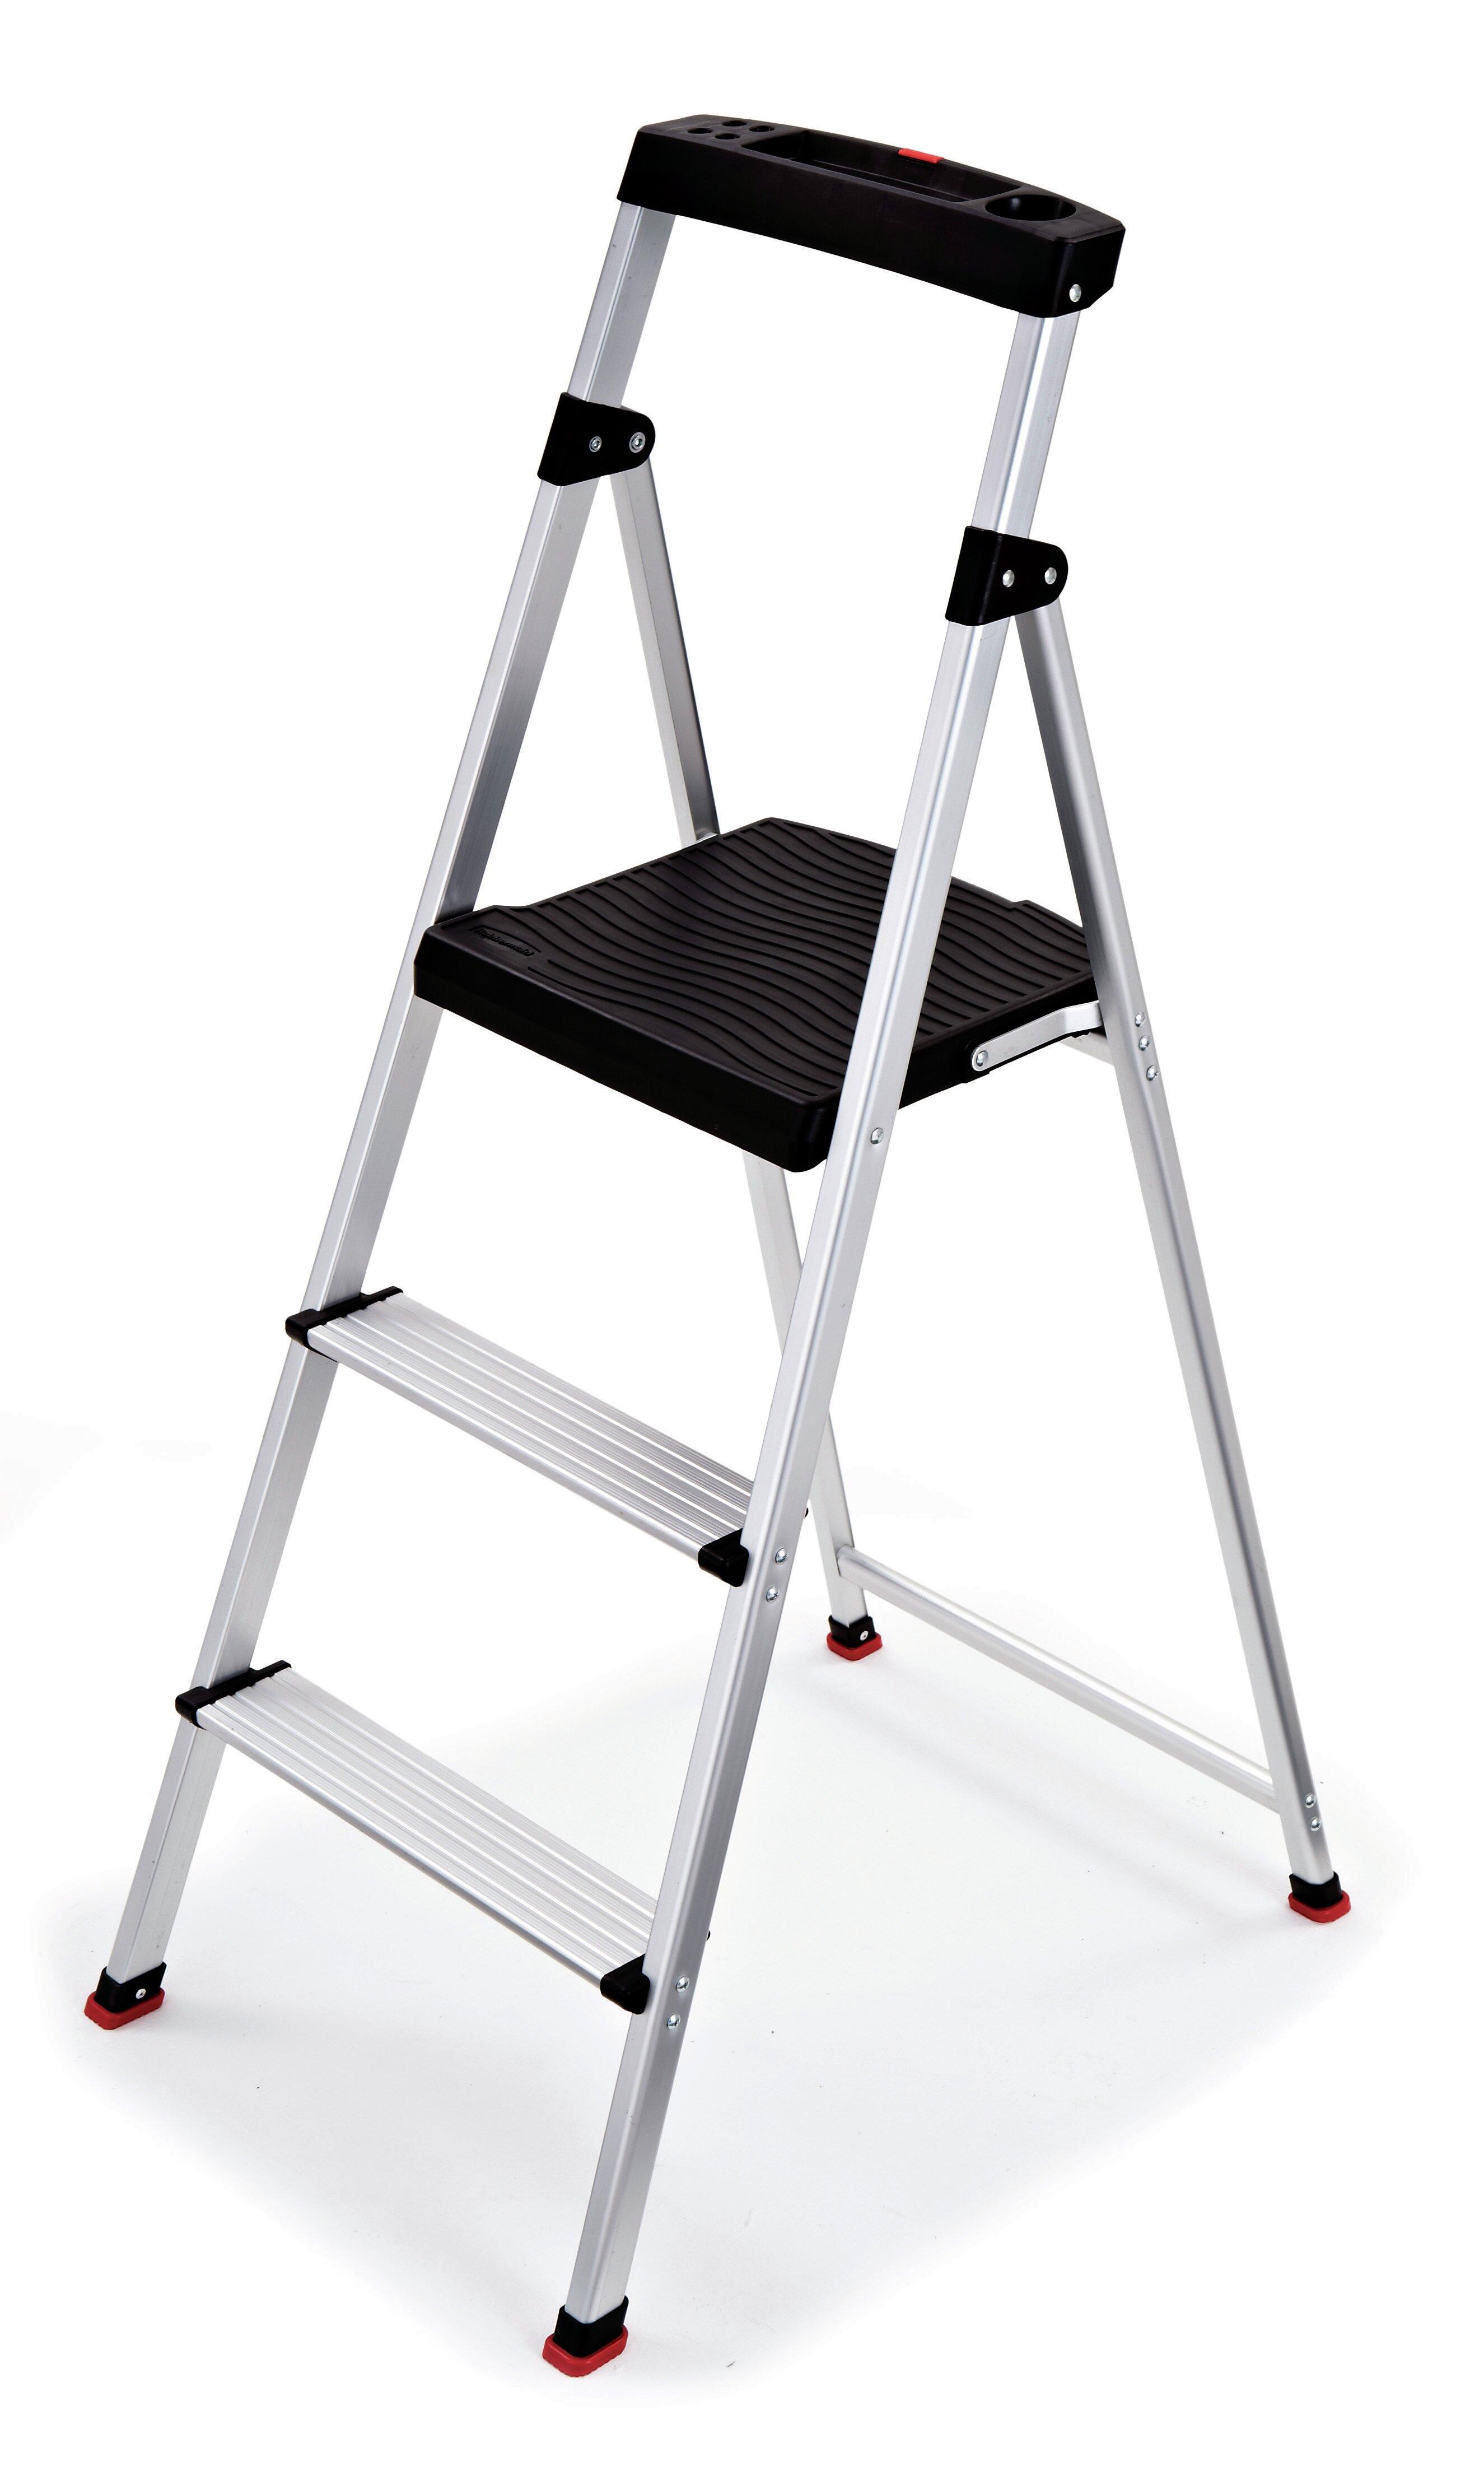 Astounding 3 Step Aluminum Step Stool With 225 Lb Load Capacity Evergreenethics Interior Chair Design Evergreenethicsorg